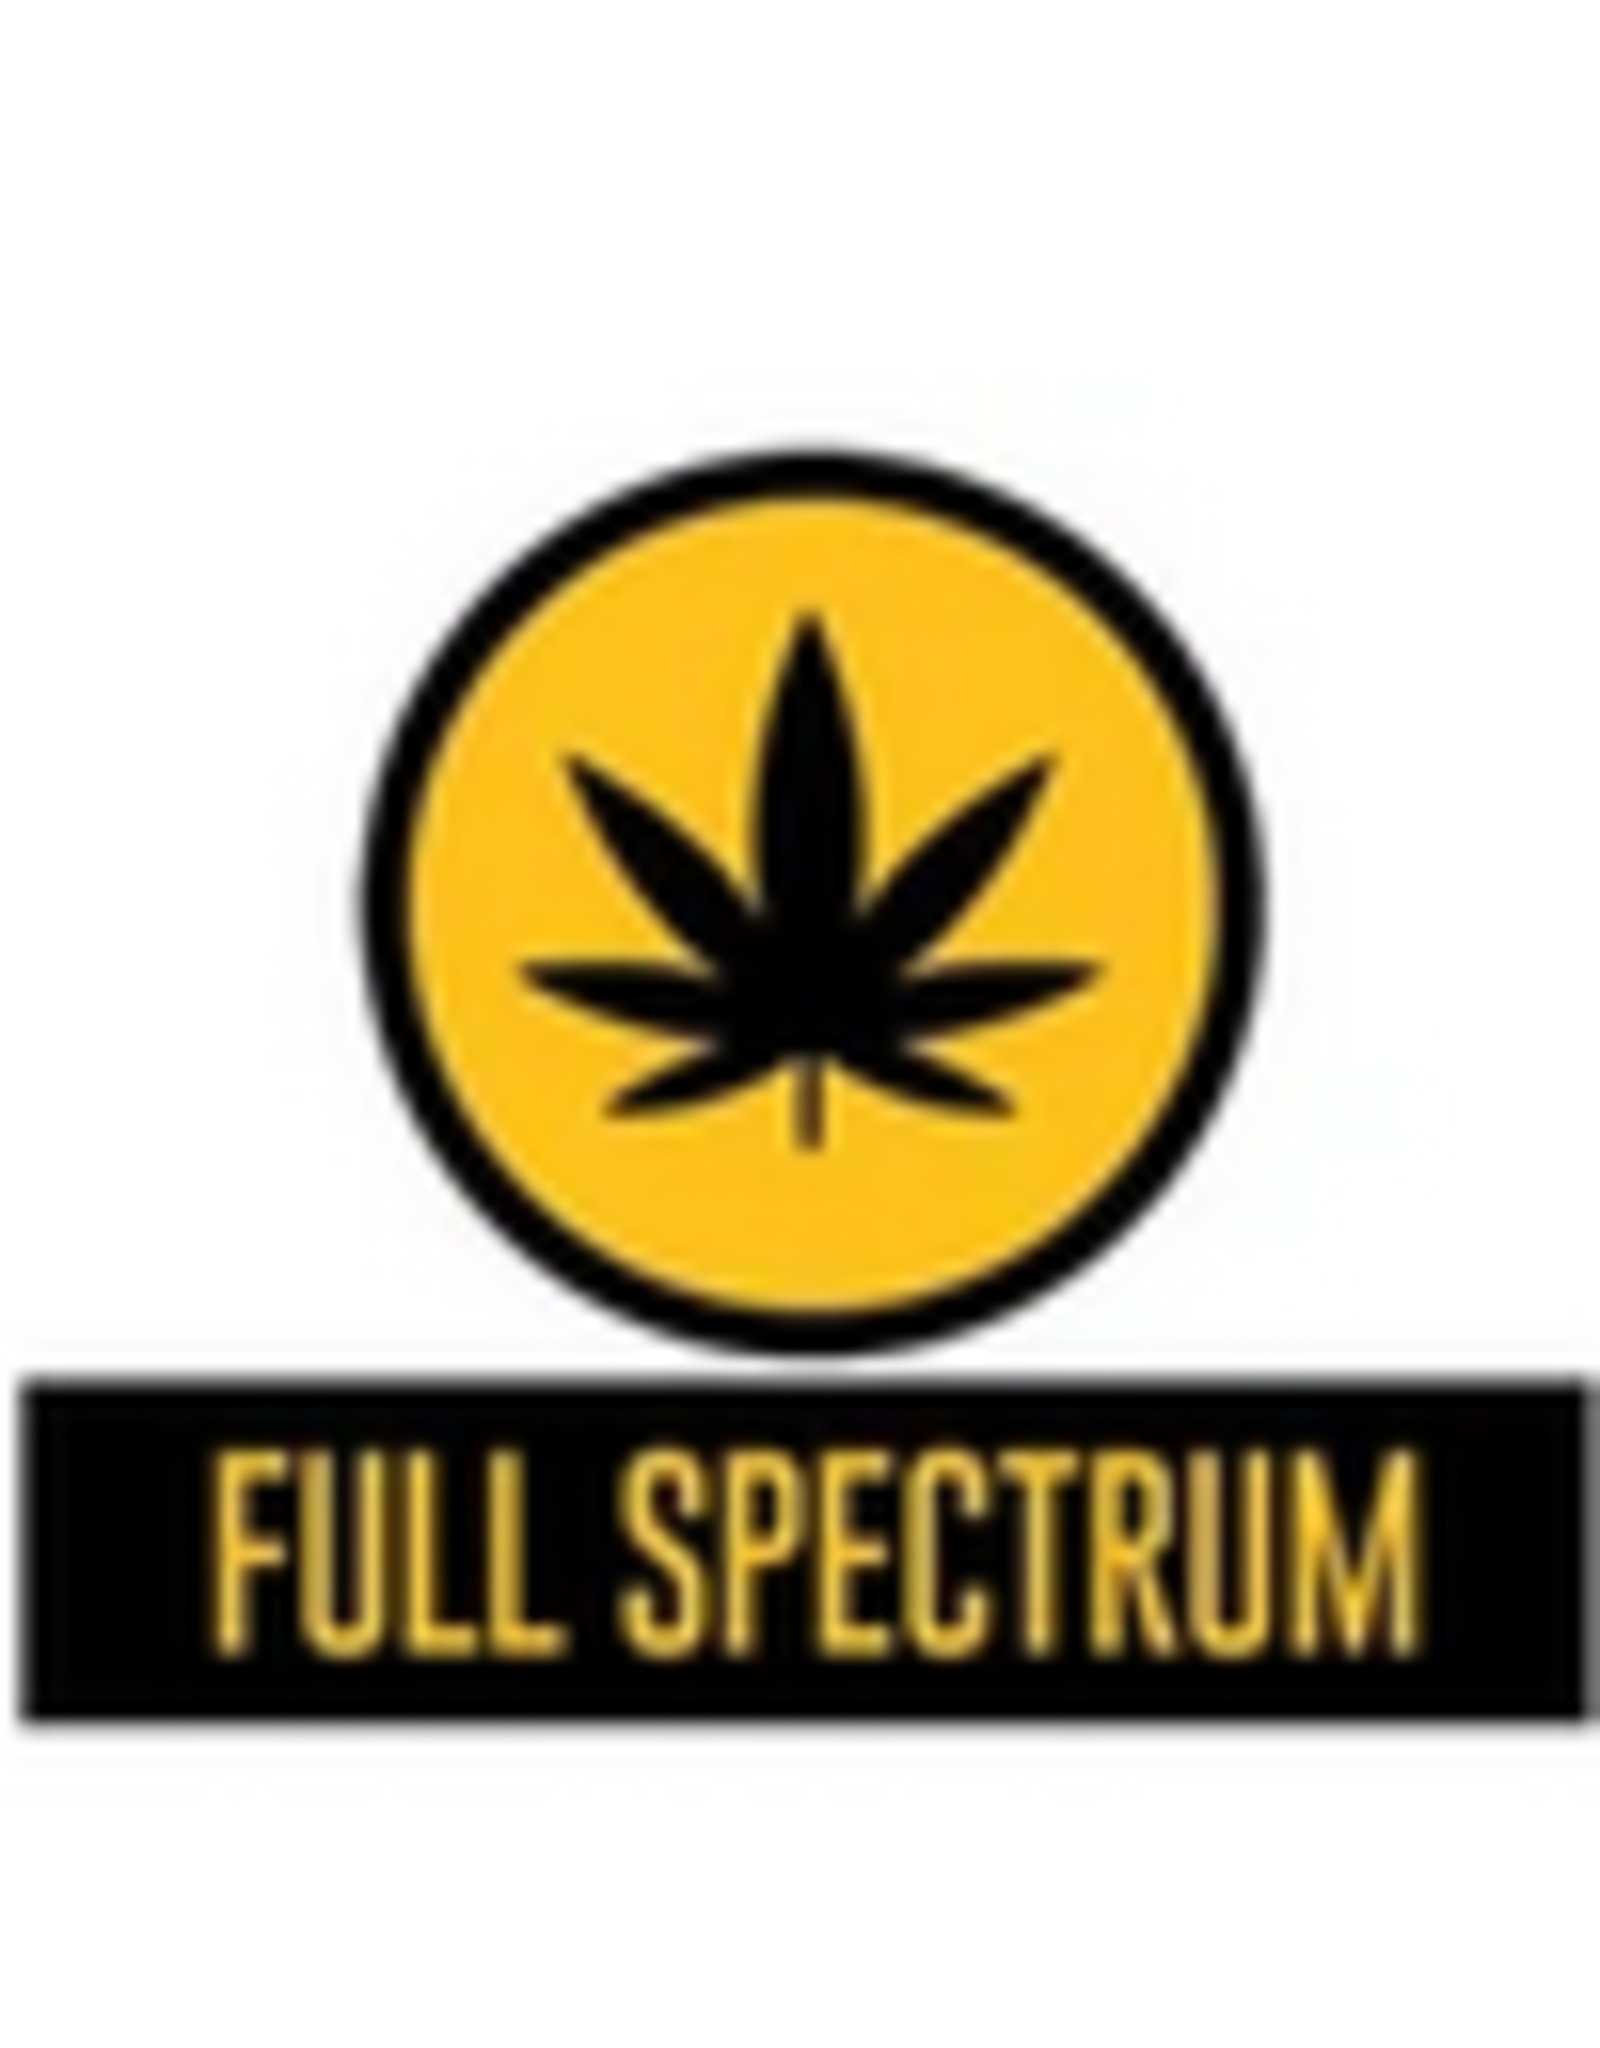 Pinnacle Hemp Full Spectrum CBD Granddaddy Purp Disposable Pen 150mg